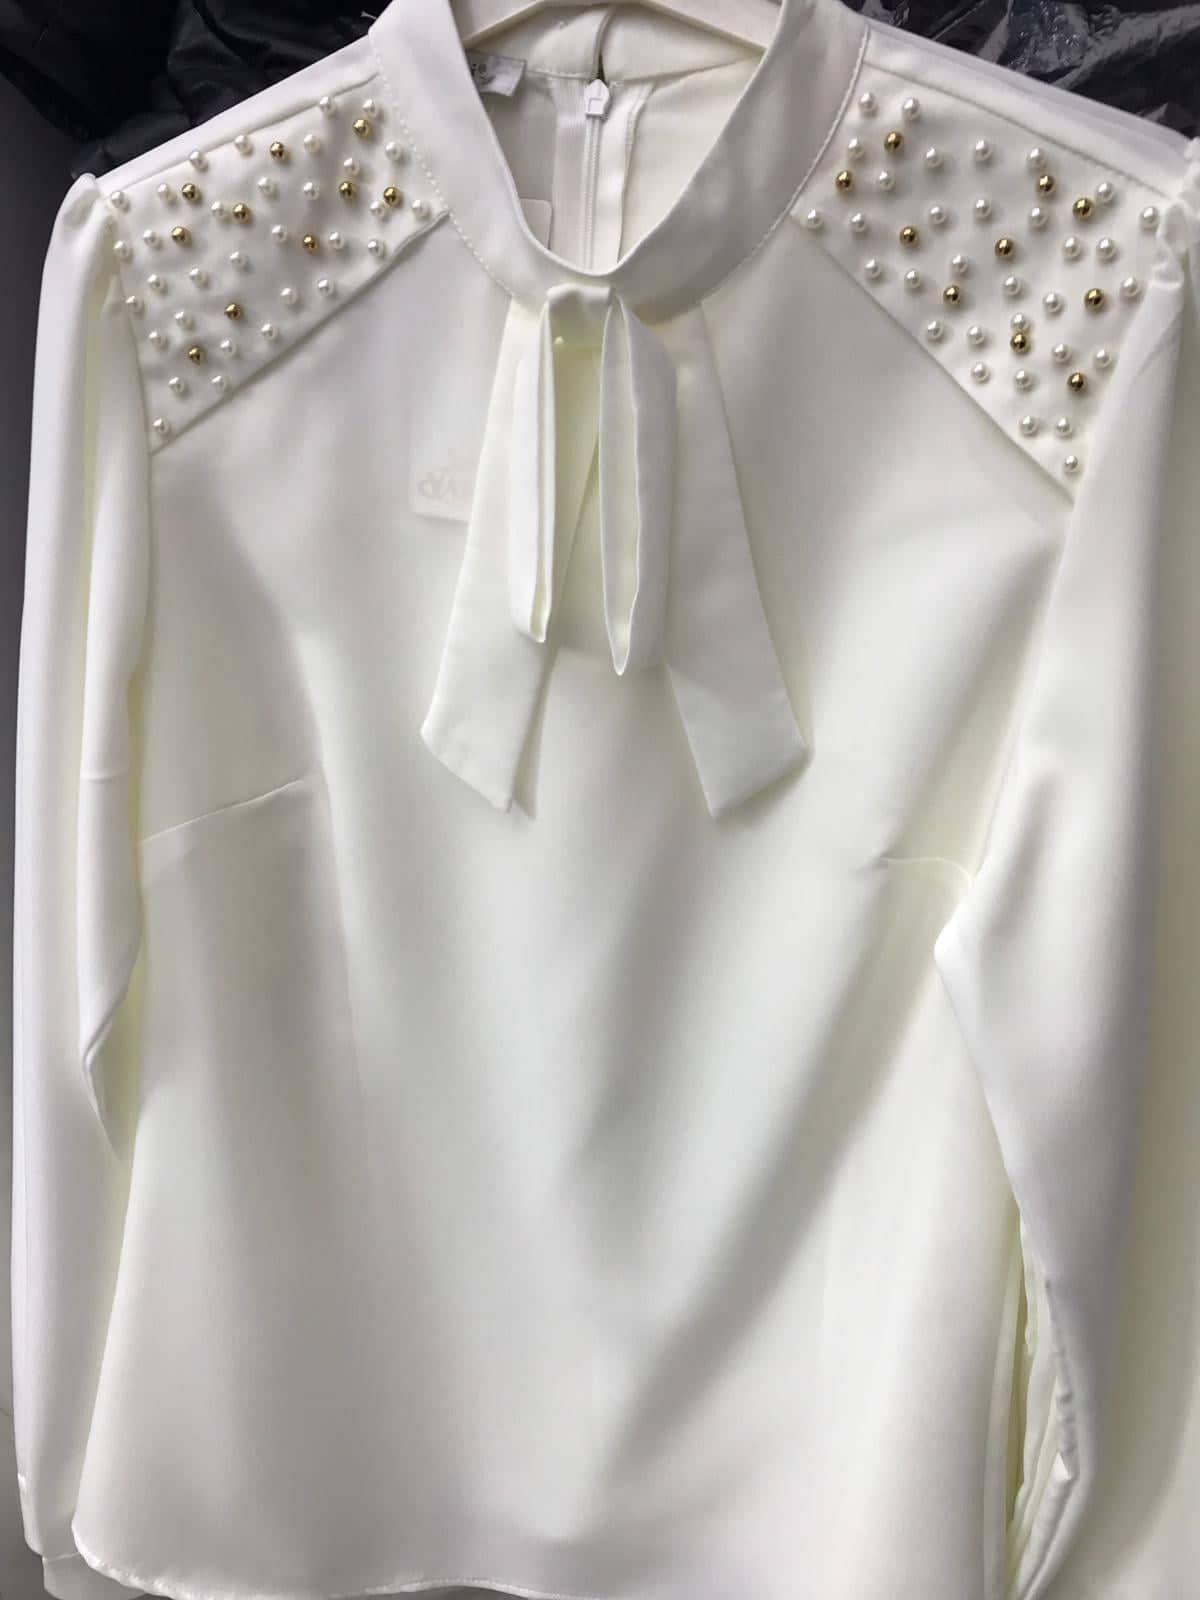 Whole Sale Optom Prodazha For Details 90 533 654 31 25 Whatsapp Russian English Bayan Ust Giyim Giyim Fashion Tops